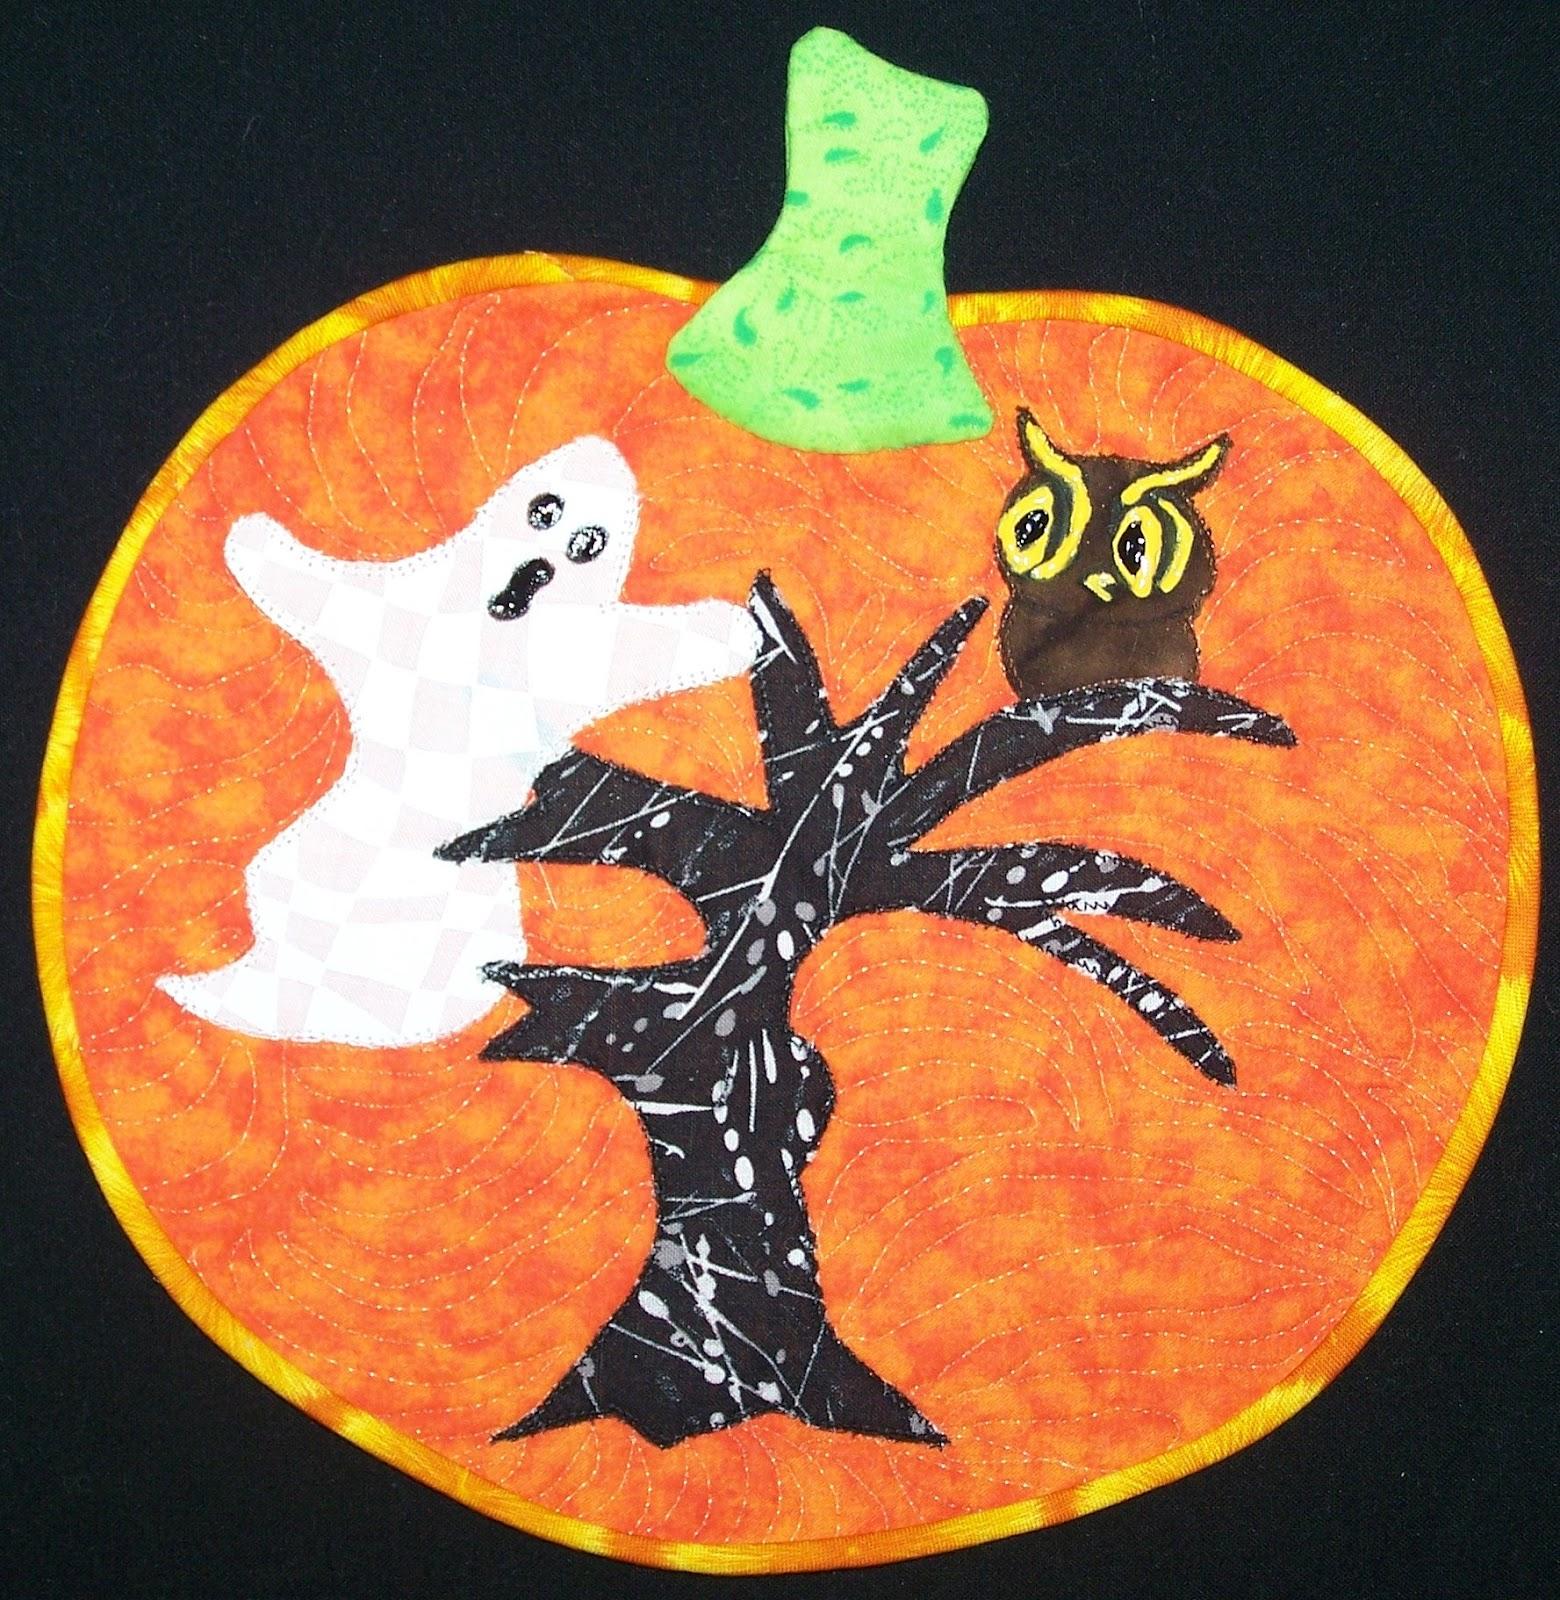 Damsel Quilts & Crafts: Ghostly Pumpkin Mug Rug